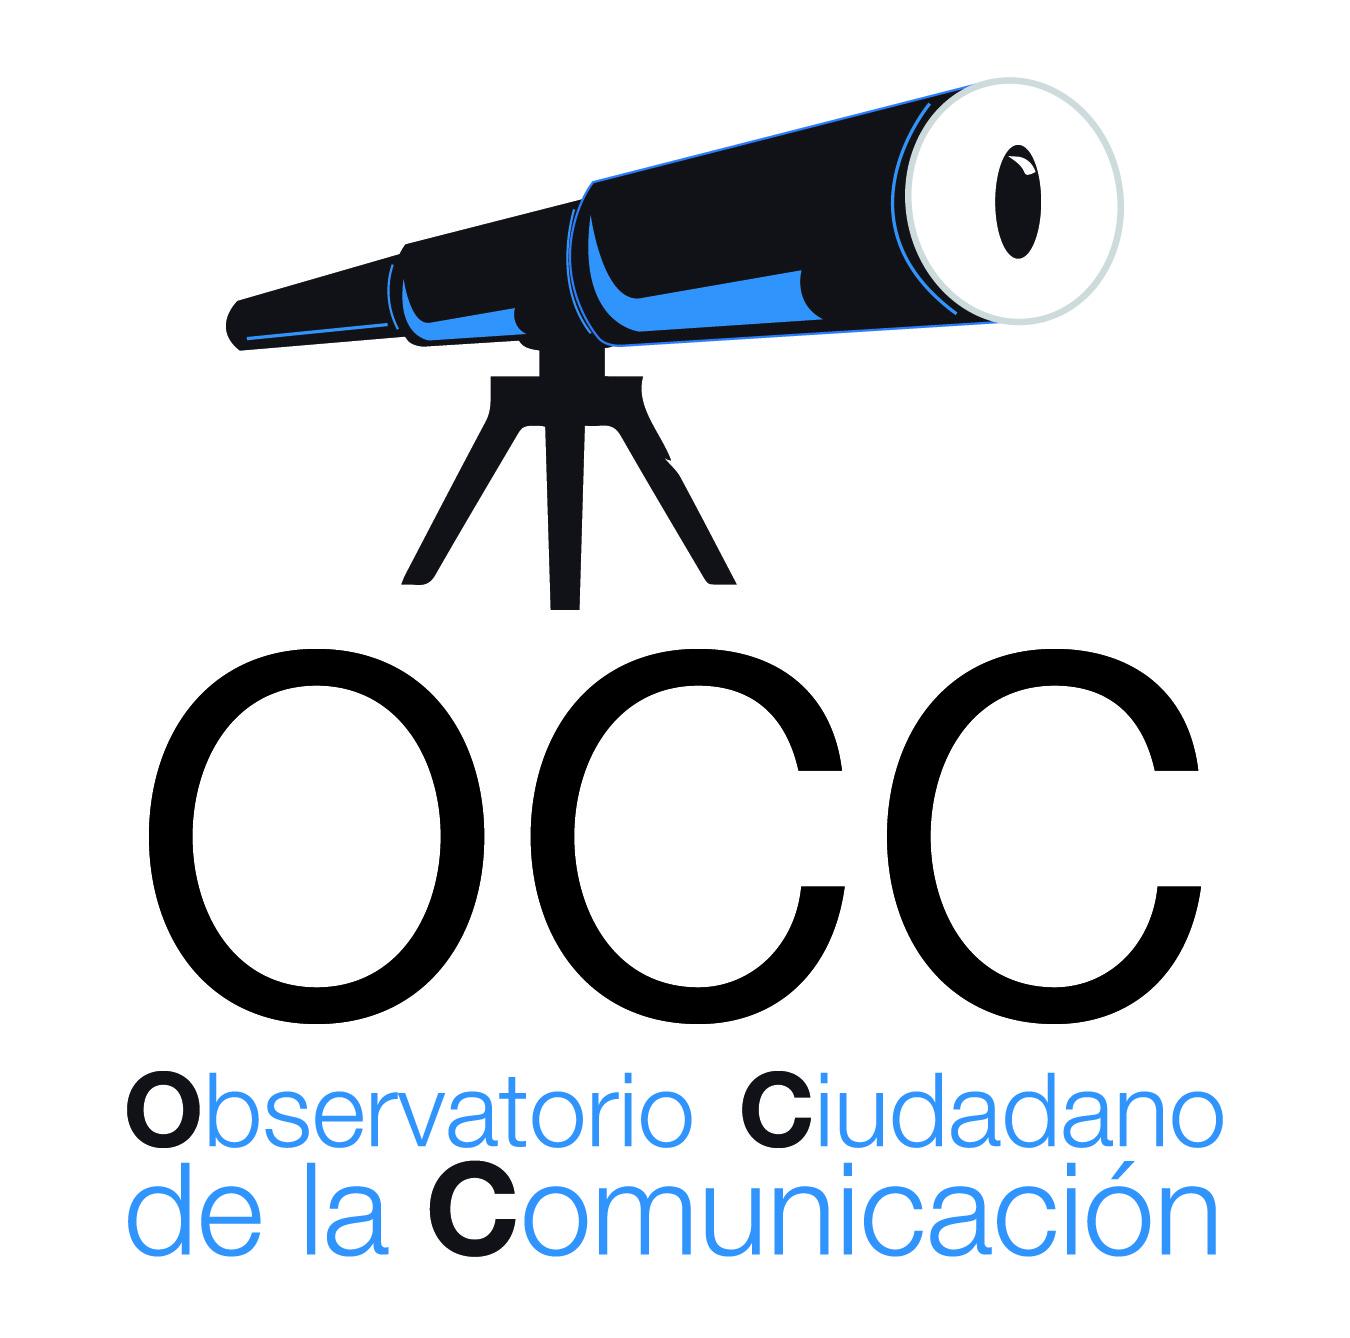 nuevo-logo-occ-01.jpg